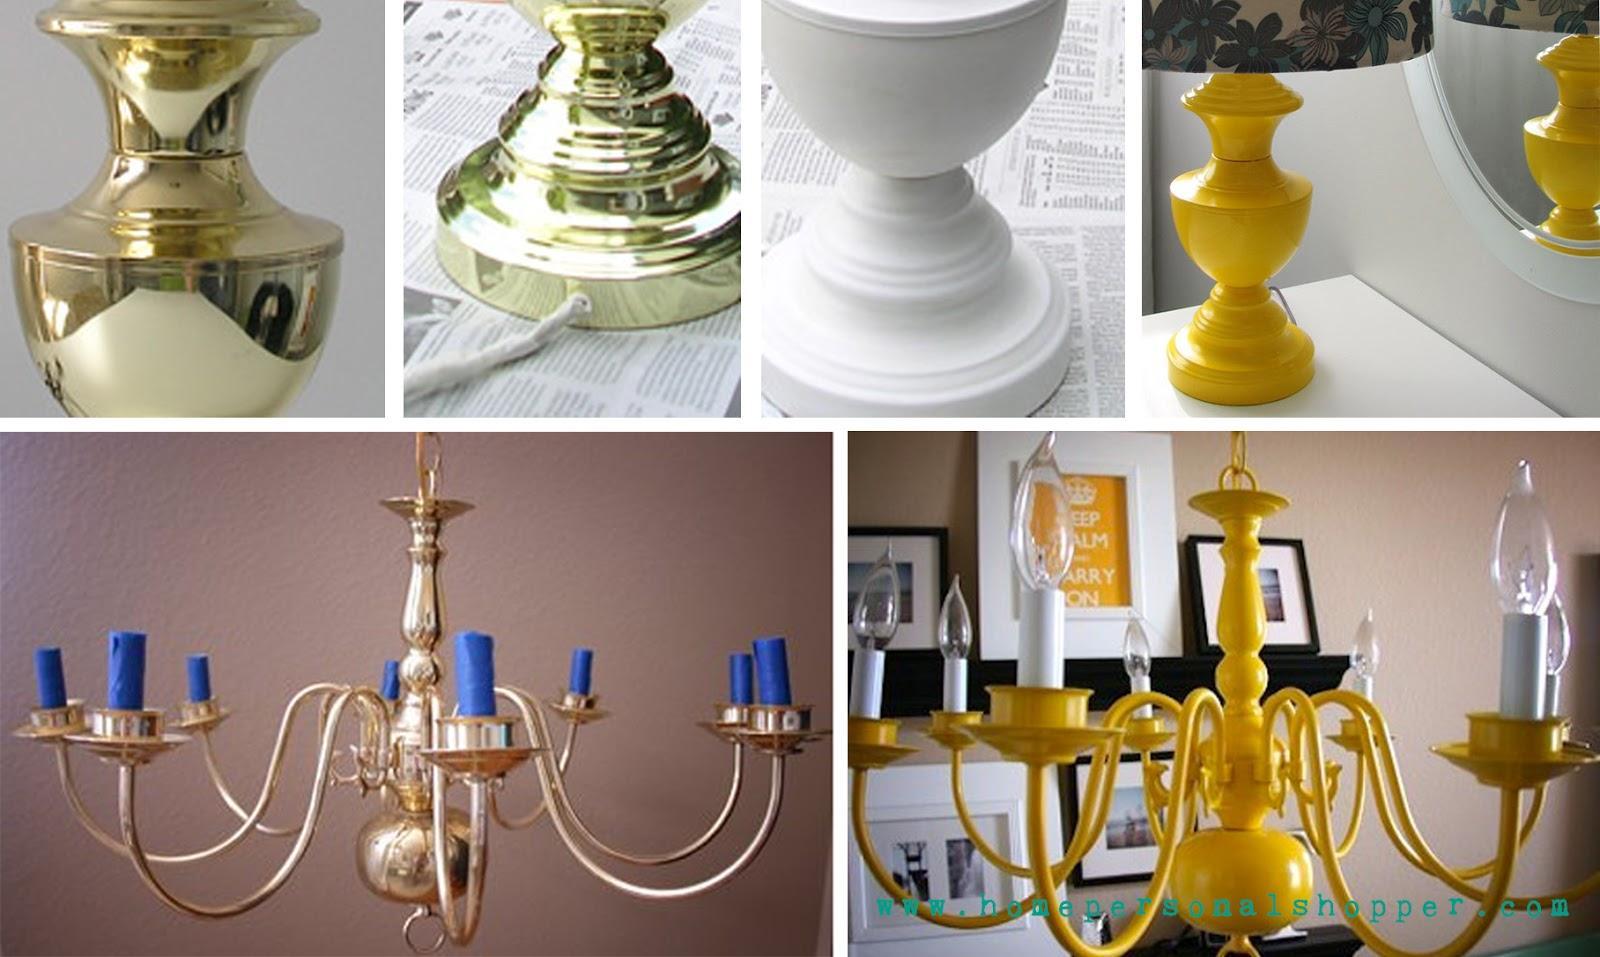 Pintar objetos con spray paperblog for Pintar muebles con spray